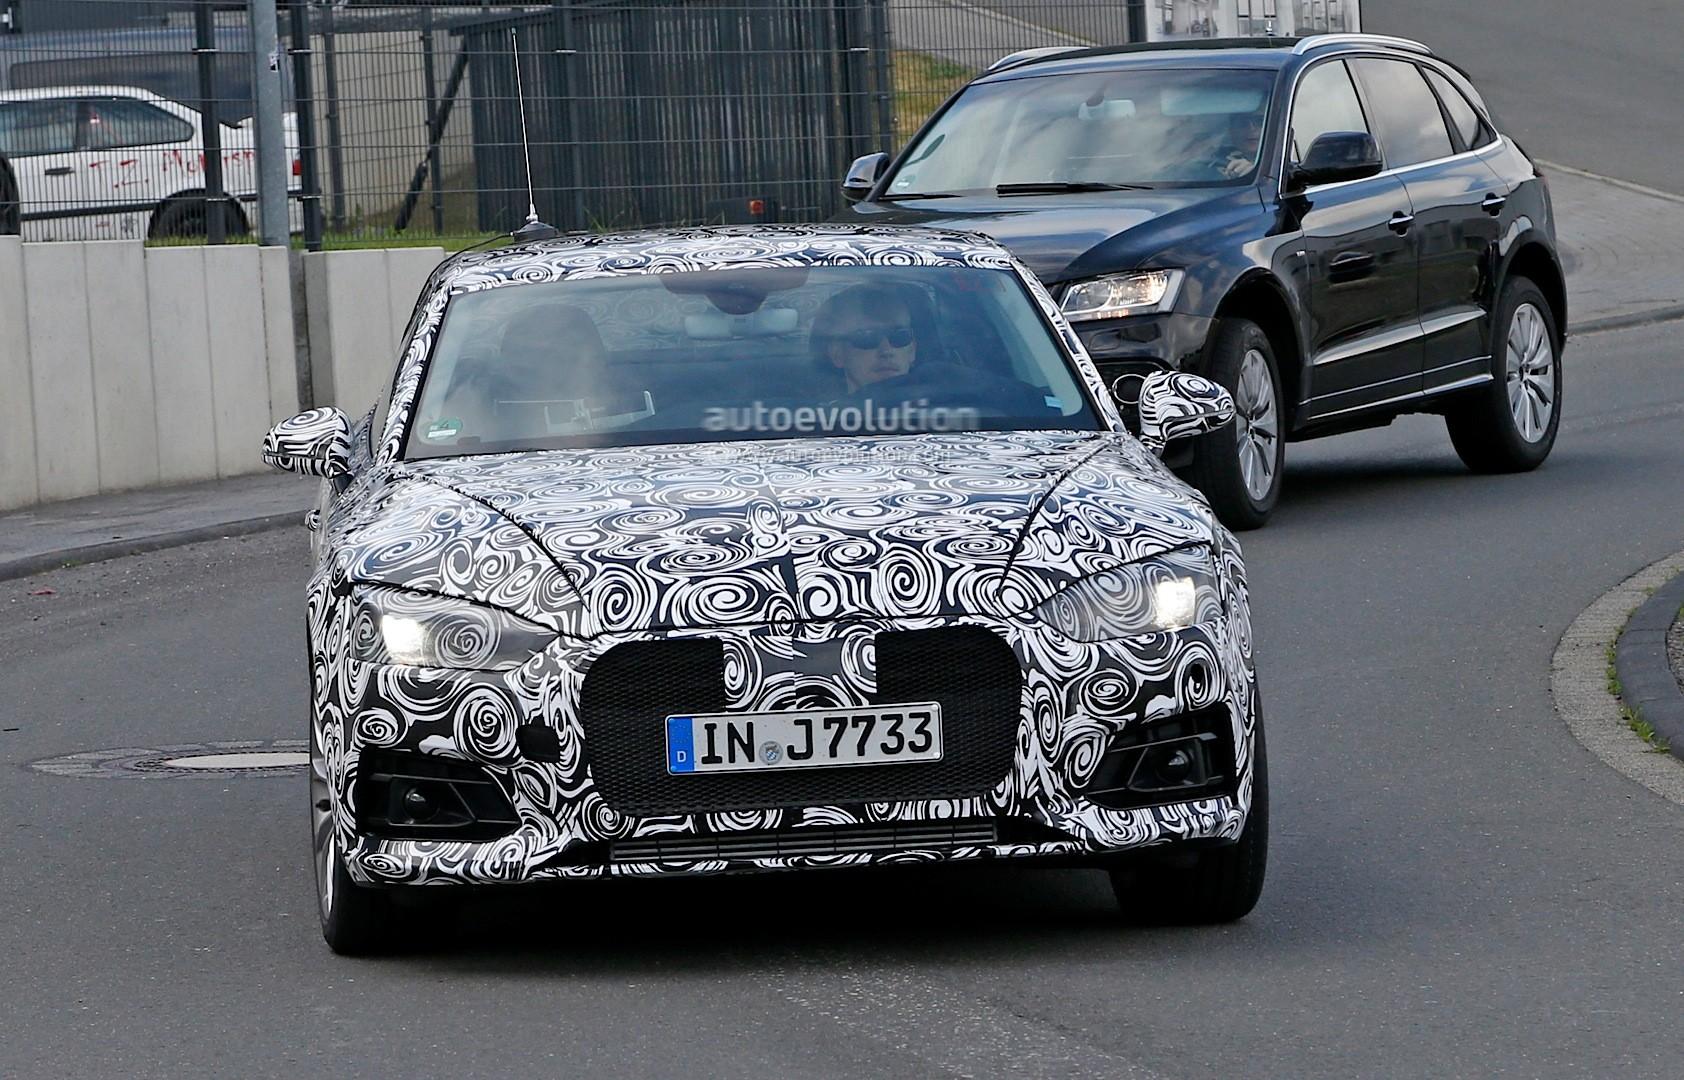 2016 - [Audi] A5 Coupé, Cabriolet et Sportback - Page 2 All-new-2017-audi-a5-coupe-first-spy-photos-show-evolutionary-design_1